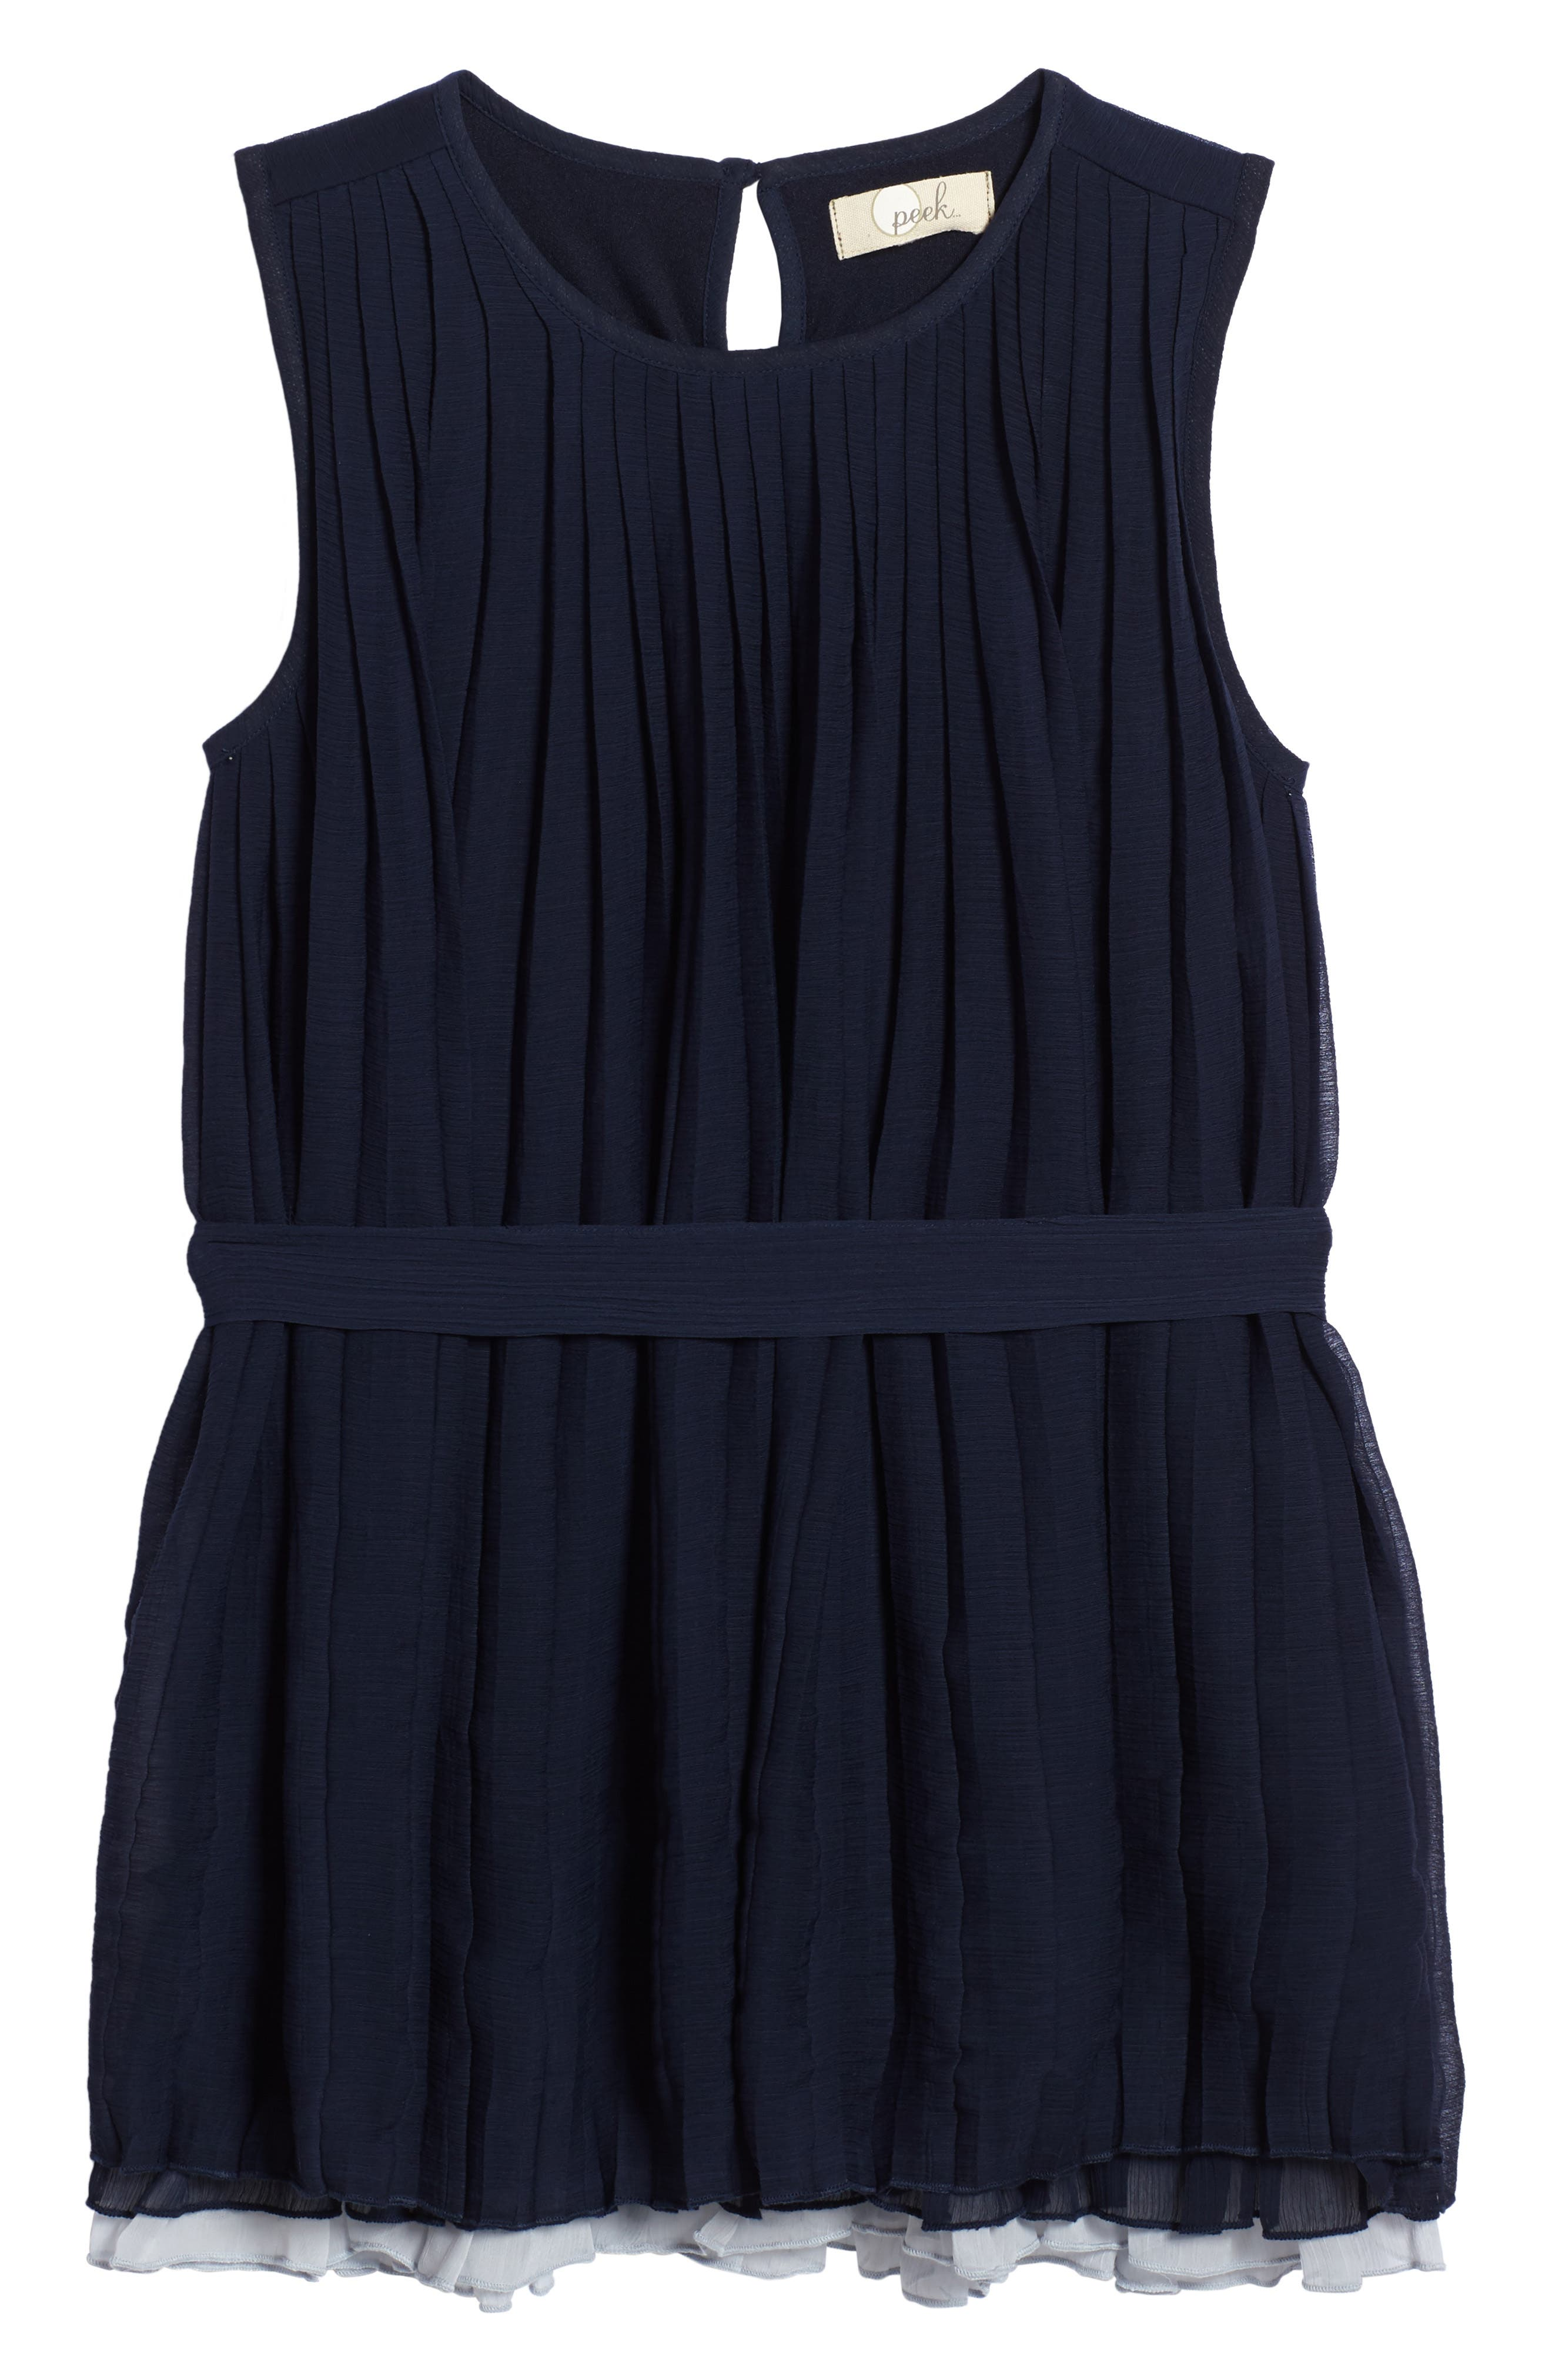 Alternate Image 1 Selected - Peek Stefanie Pleated Dress (Toddler Girls, Little Girls & Big Girls)